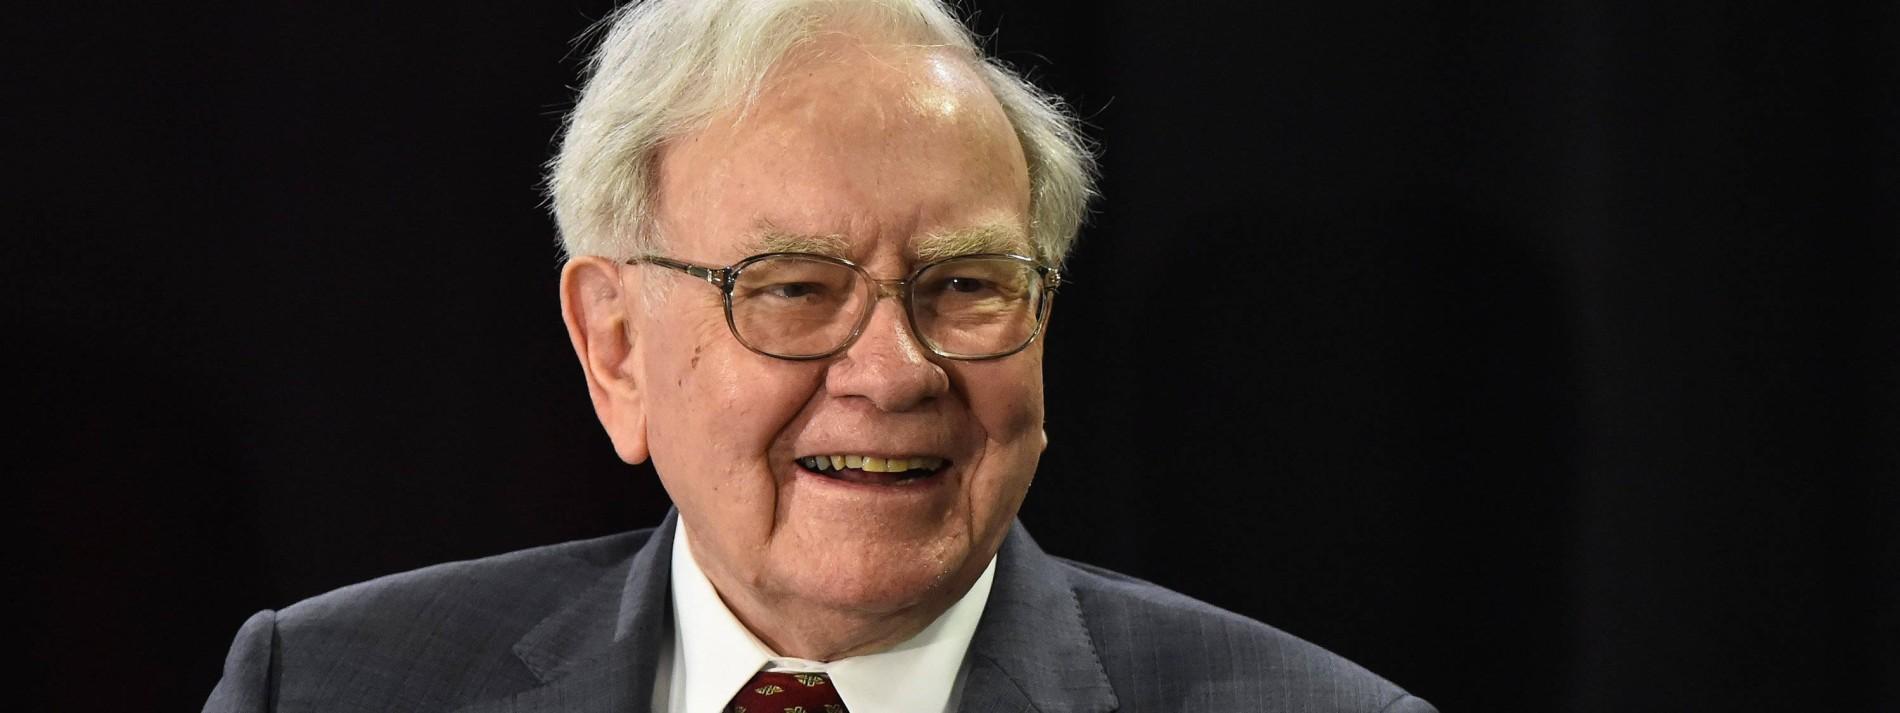 Warren Buffetts Investmentfirma kauft Precision Castparts